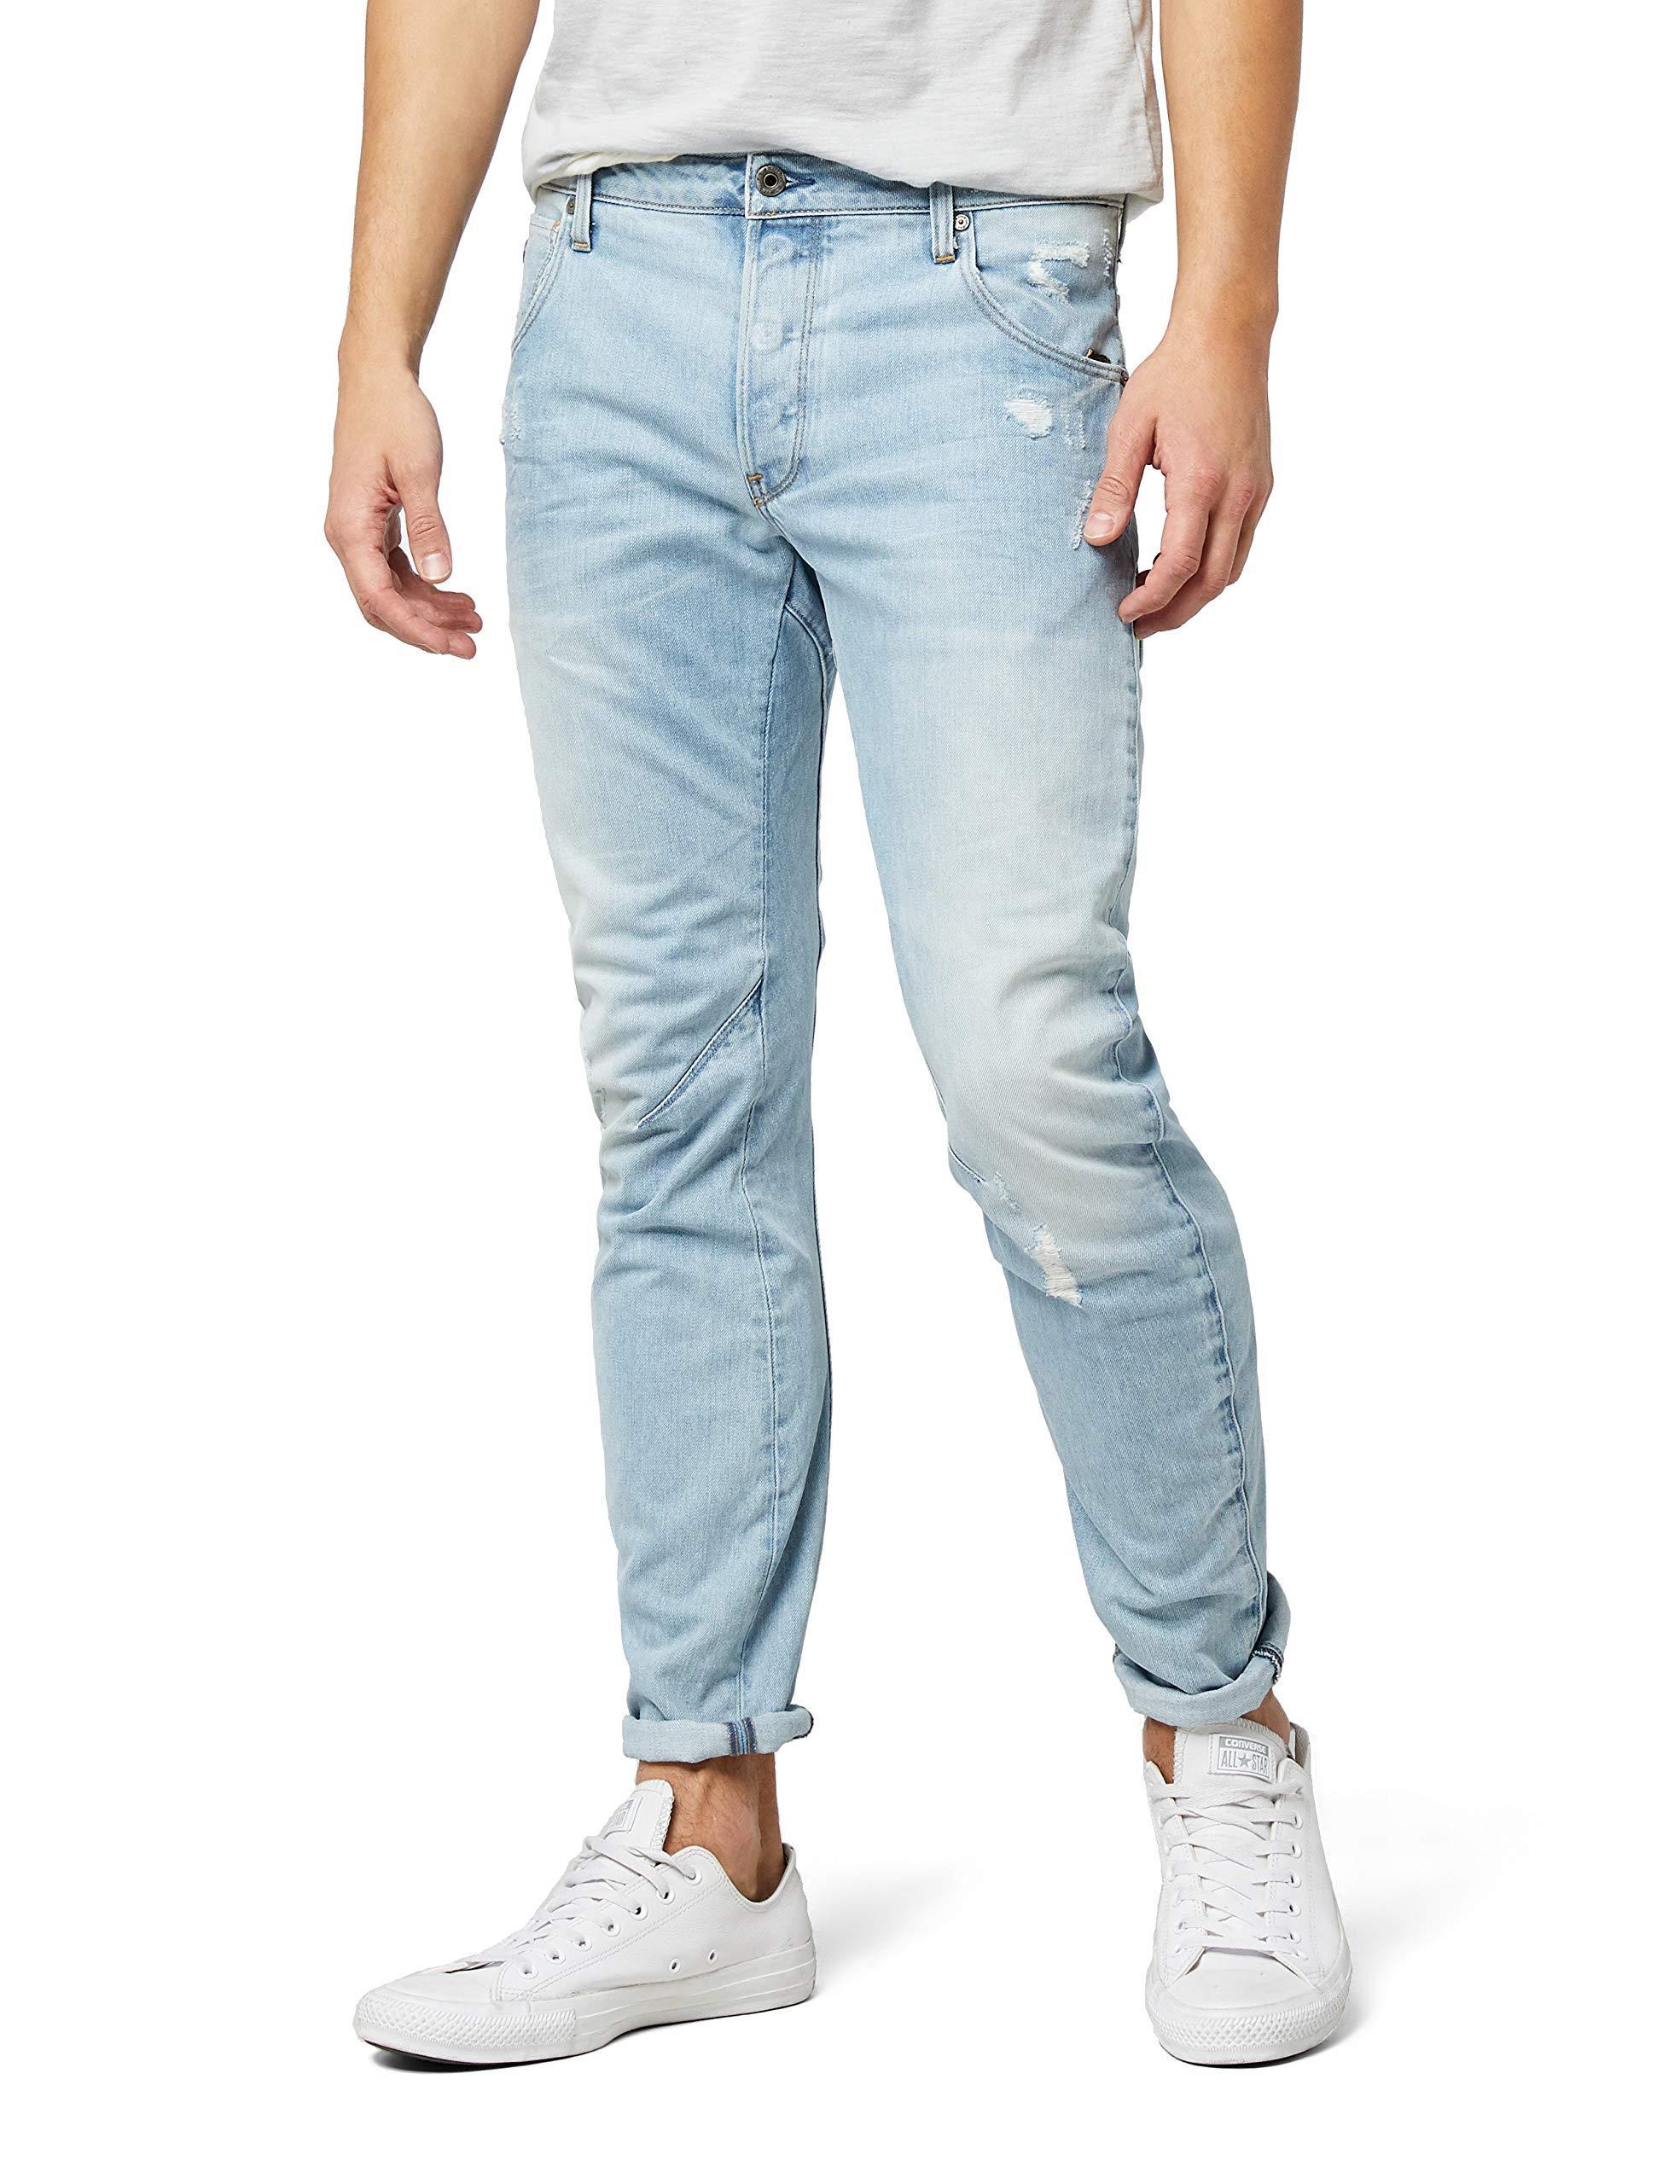 G-Star Homme Jeans Arc 3d-Slim Fit-Bleu Authentic Faded Blue STRETCHJEANS